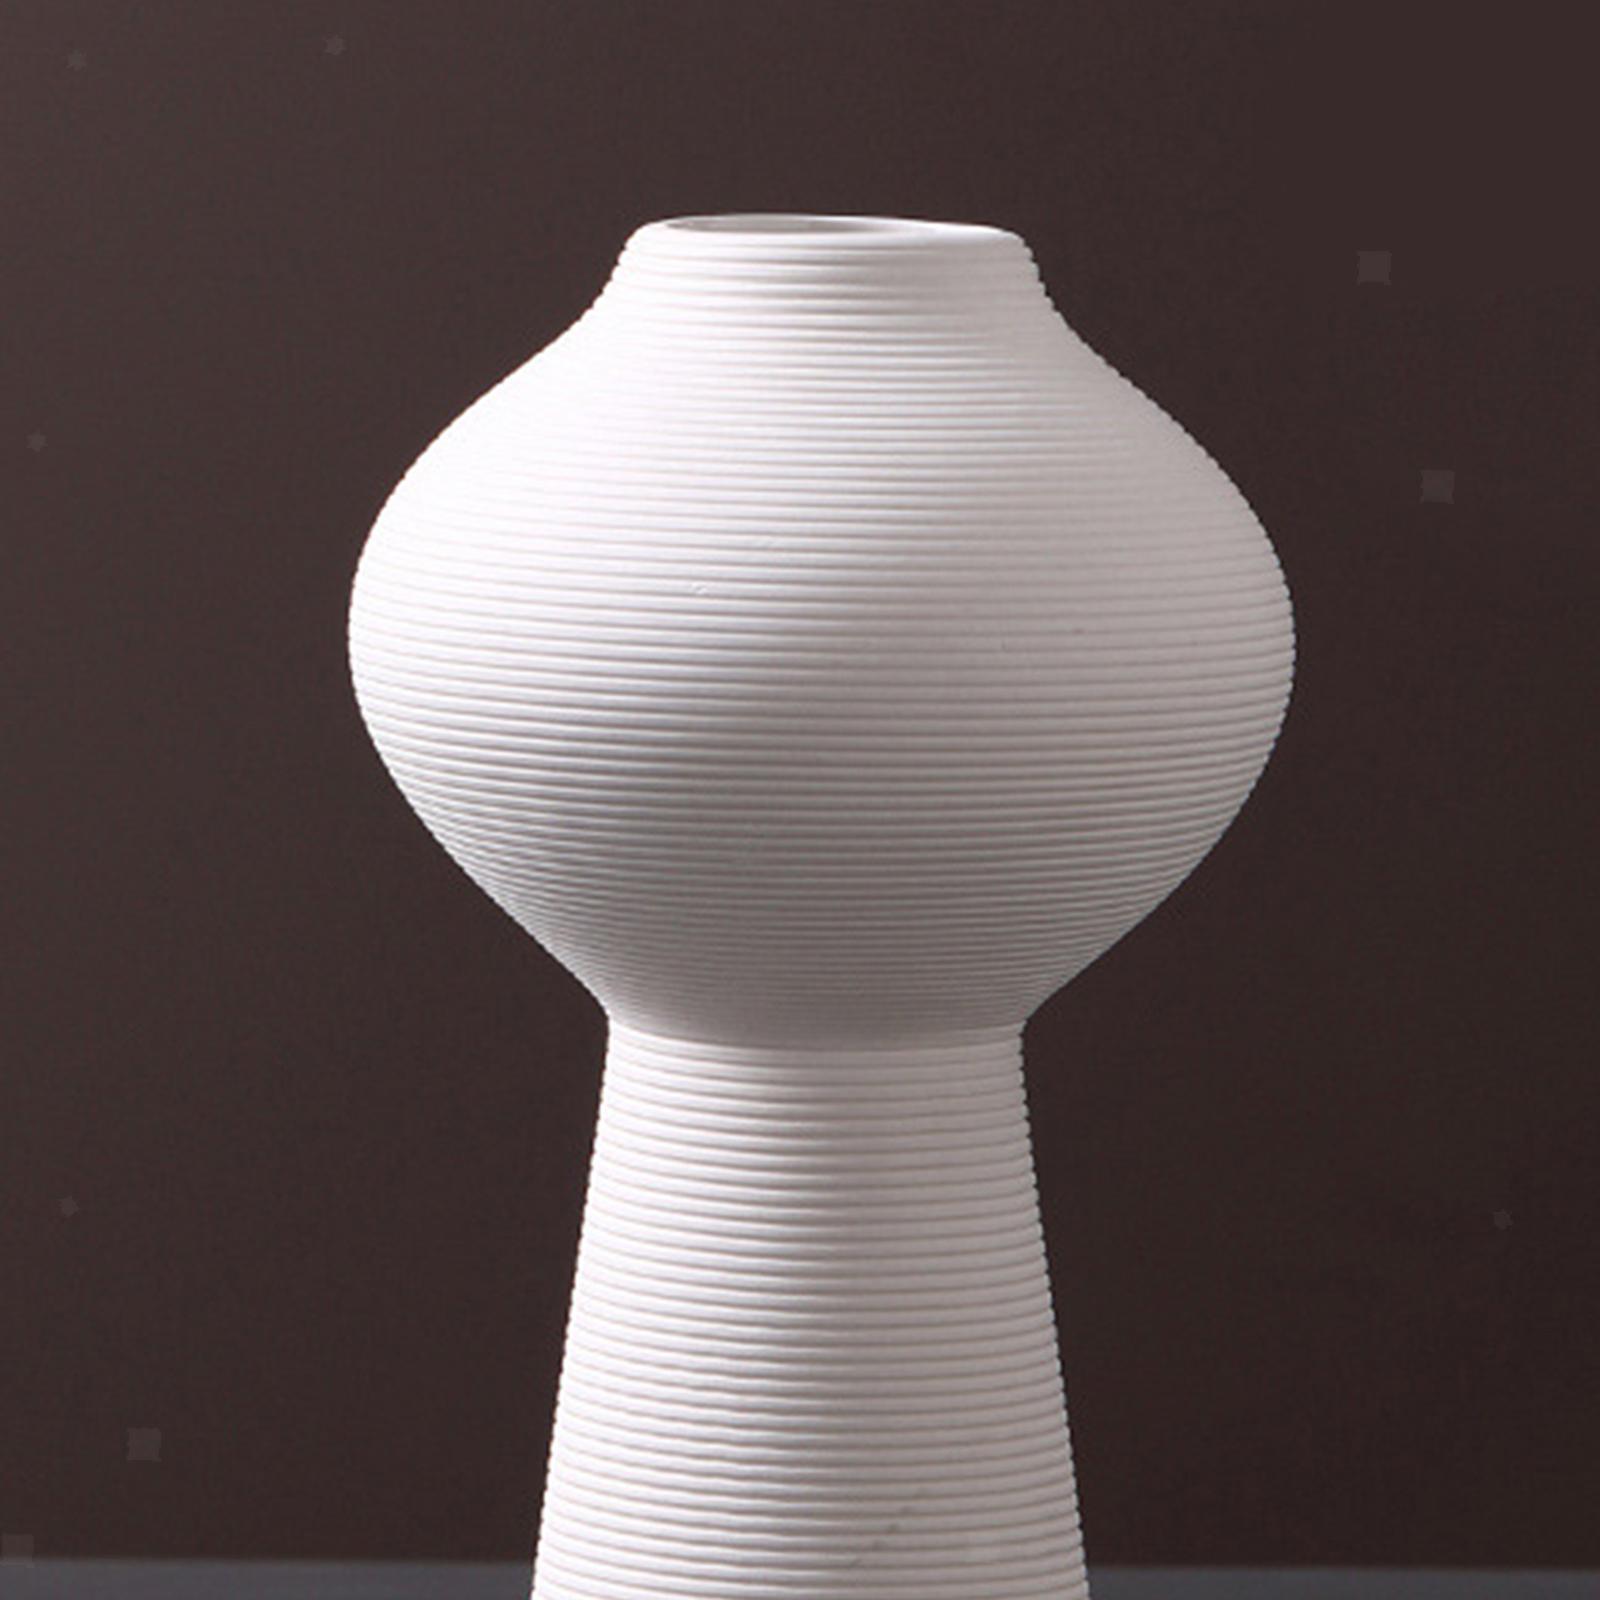 Indexbild 12 - Keramik Blumenvase Blumentöpfe Trockenblumenornamente Blumenvase Dekor